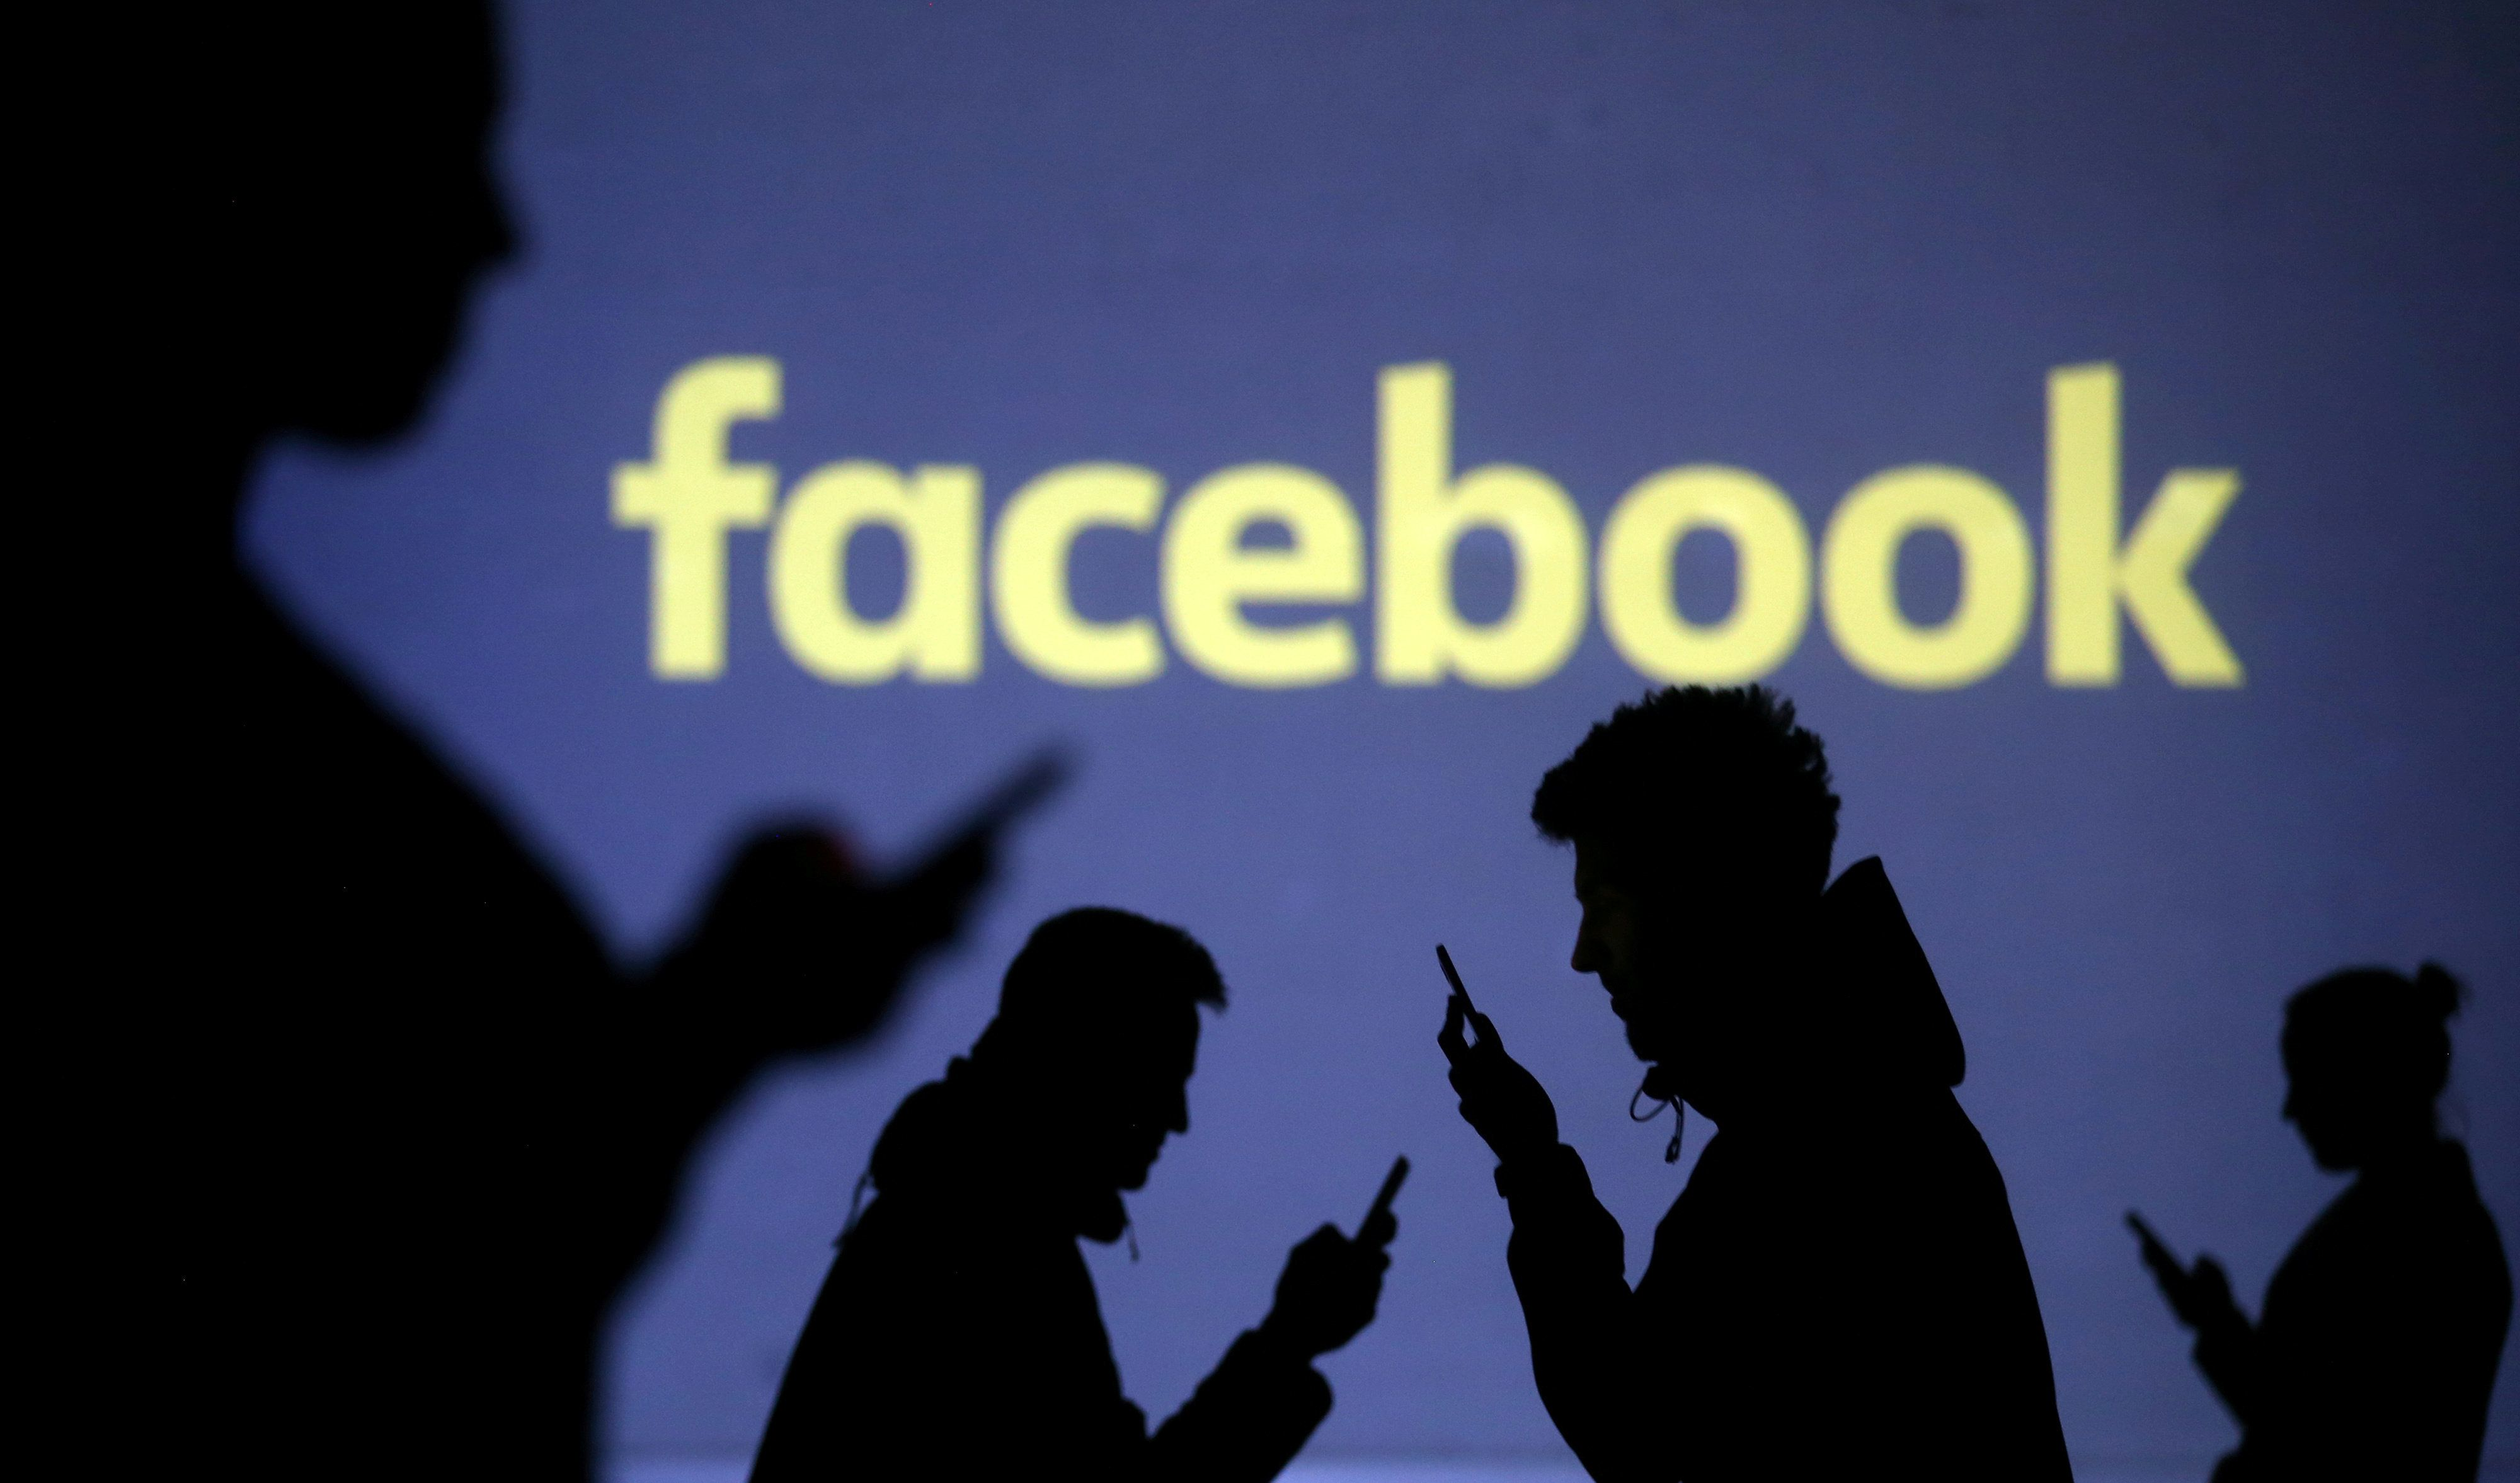 Facebook Content Moderator Says Job Gave Her PTSD Sues Company